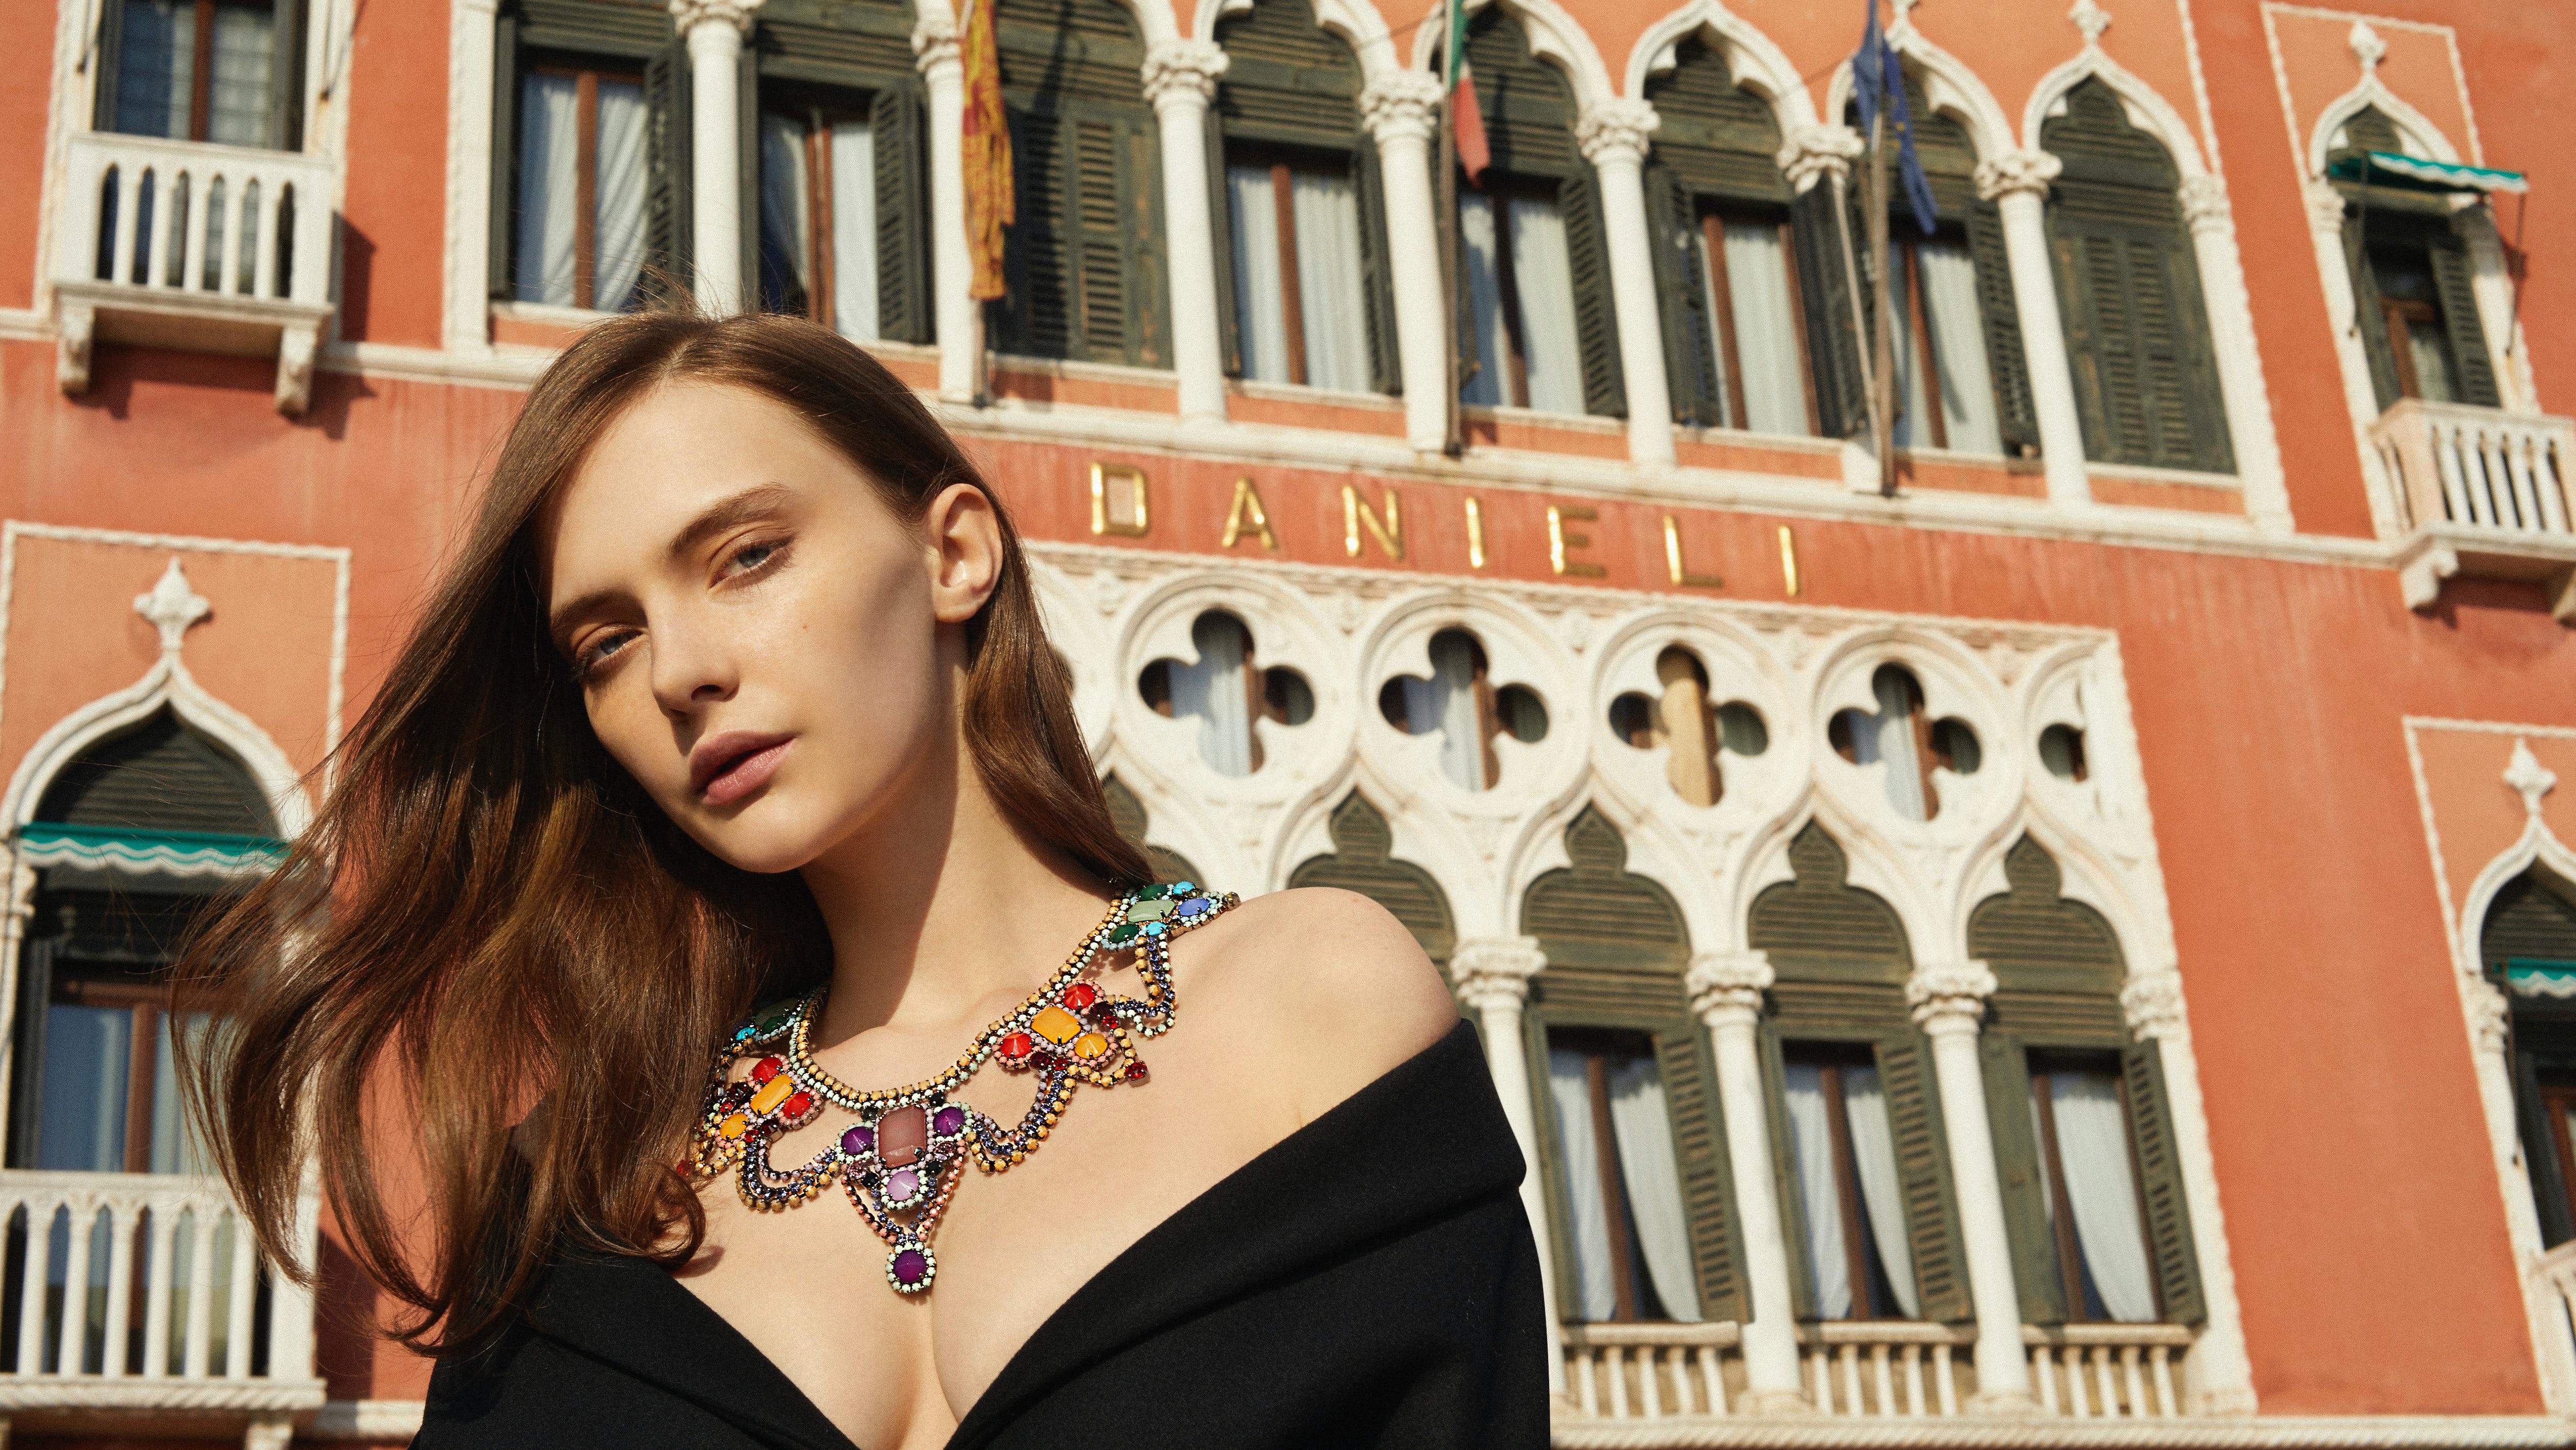 An image from a Moda Operandi fine jewellery look book | Source: Courtesy